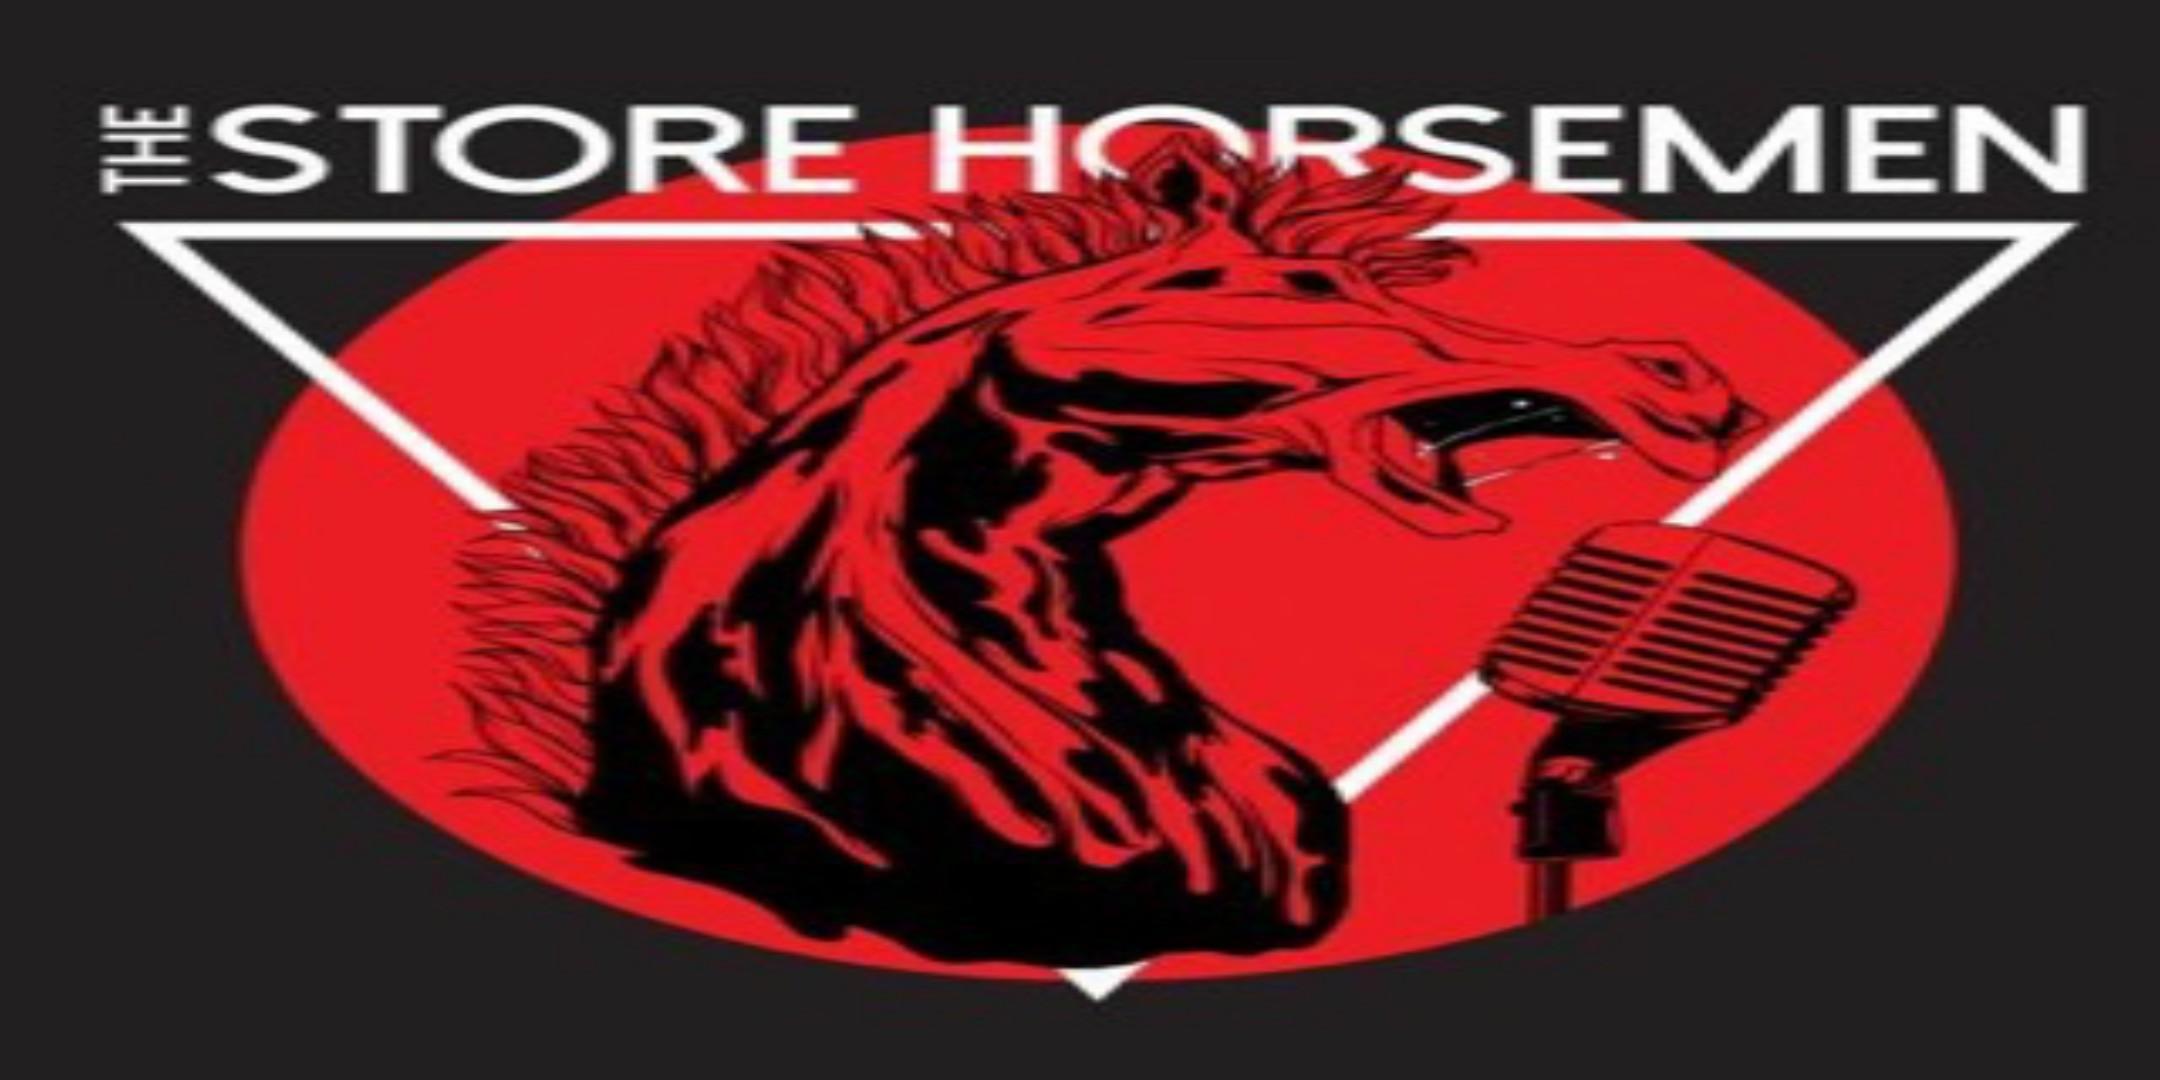 Store Horsemen Live Podcast w/ Guest David Arquette!